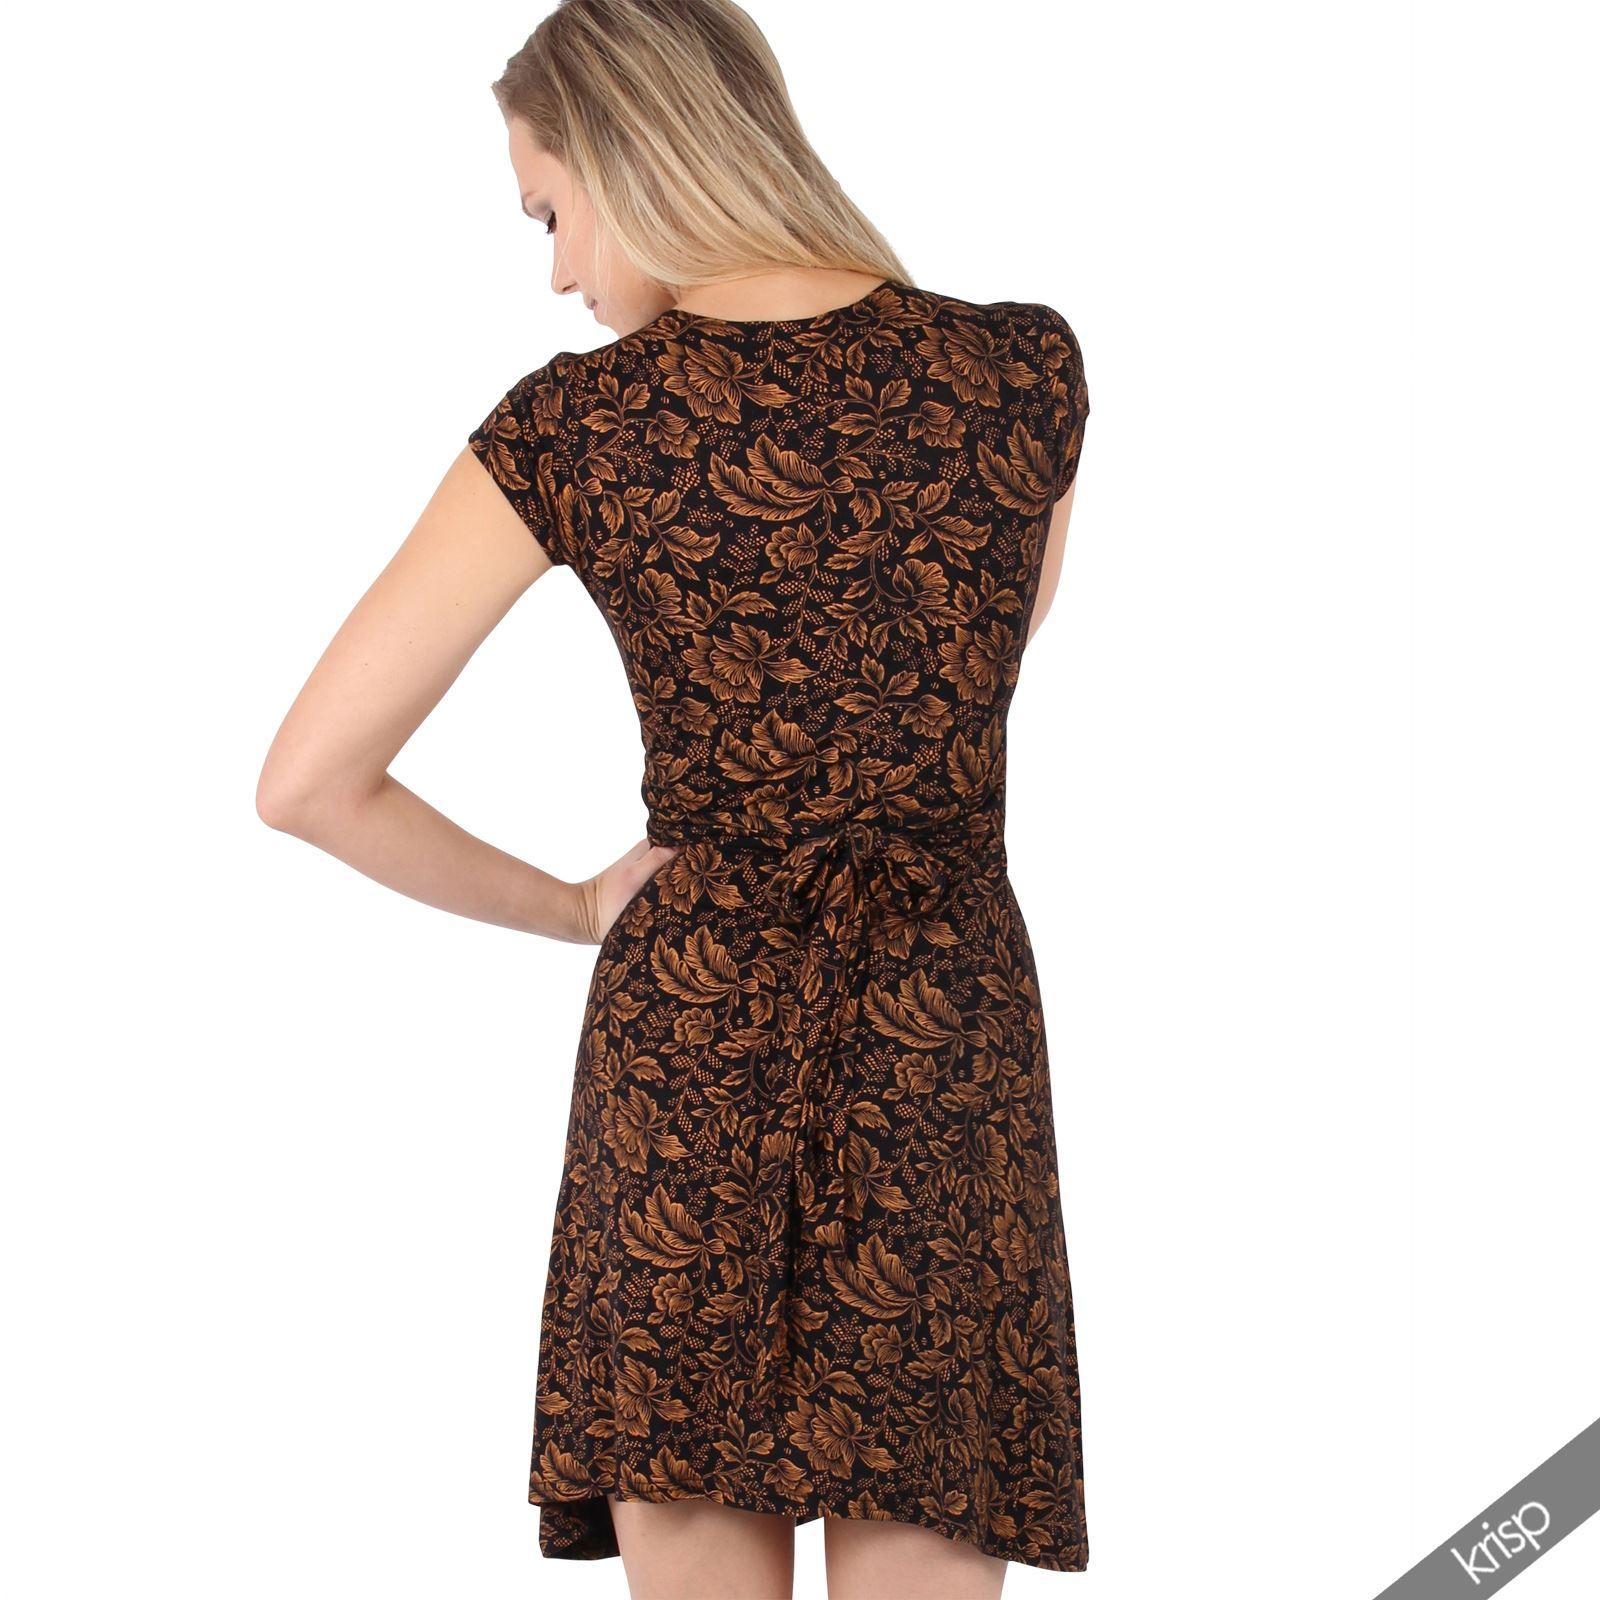 Womens Ladies V Neck Mini Midi Dress Floral Print Knot Short Skirt Party Casual